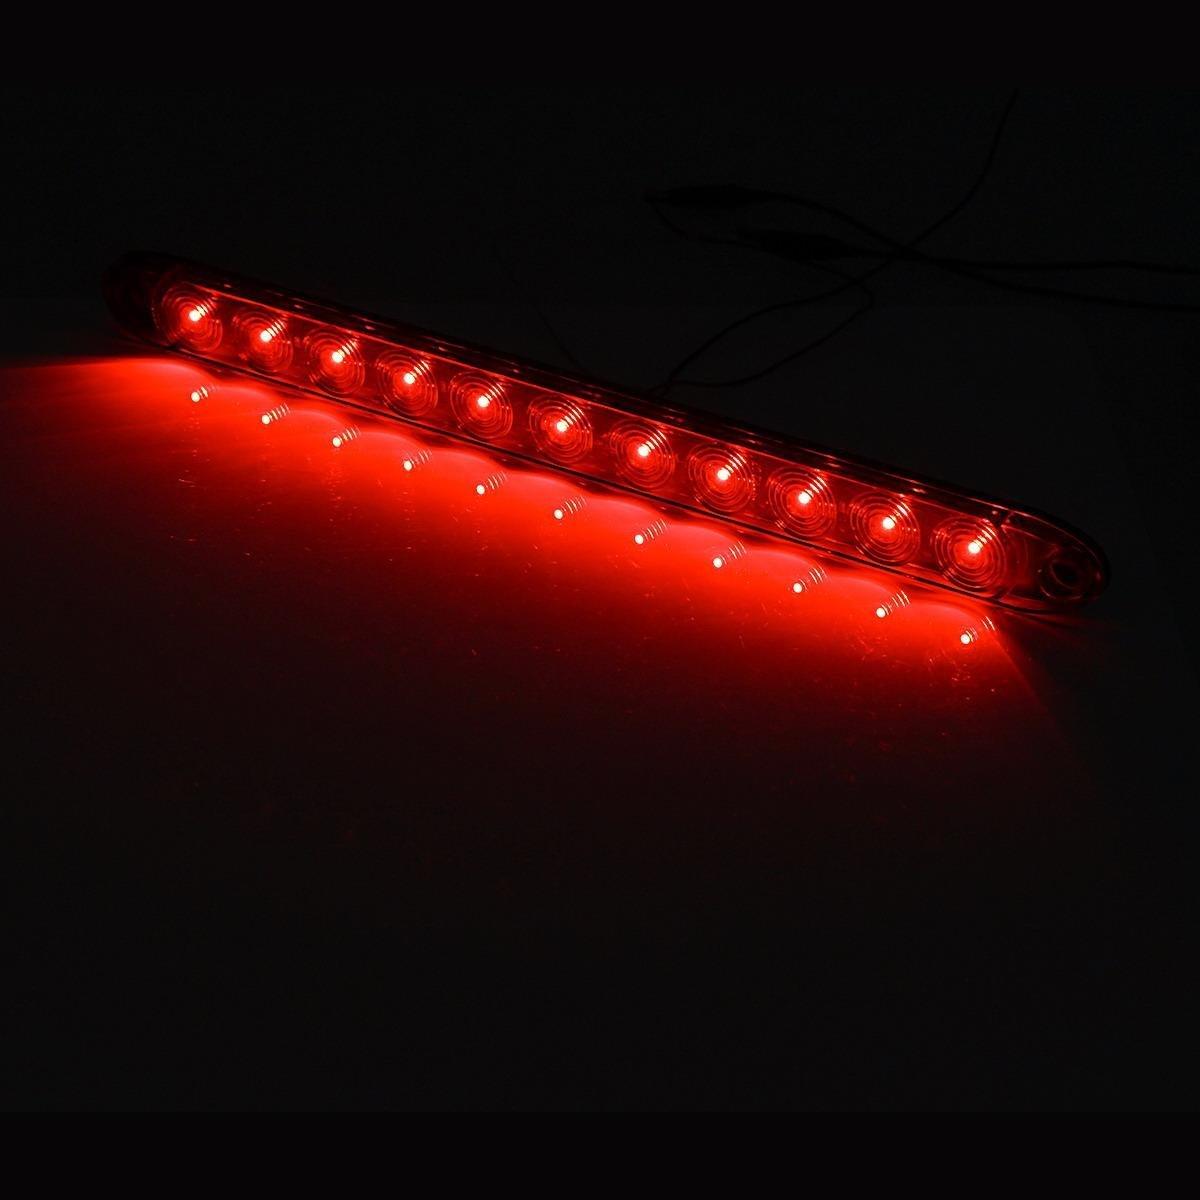 15Inch 11led Red Led Trailer Light Bar Stop Brake Lights Clear Lens Red Square Led Trailer Tail Lights+2.5 Mini Led Trailer Side Marker Lights Partsam 12v Led Trailer Lights Kit